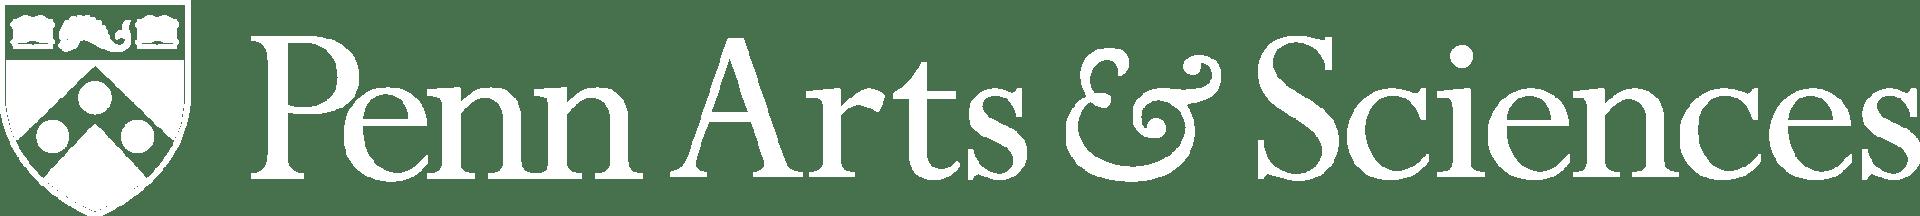 Penn Arts & Sciences Annual Fund